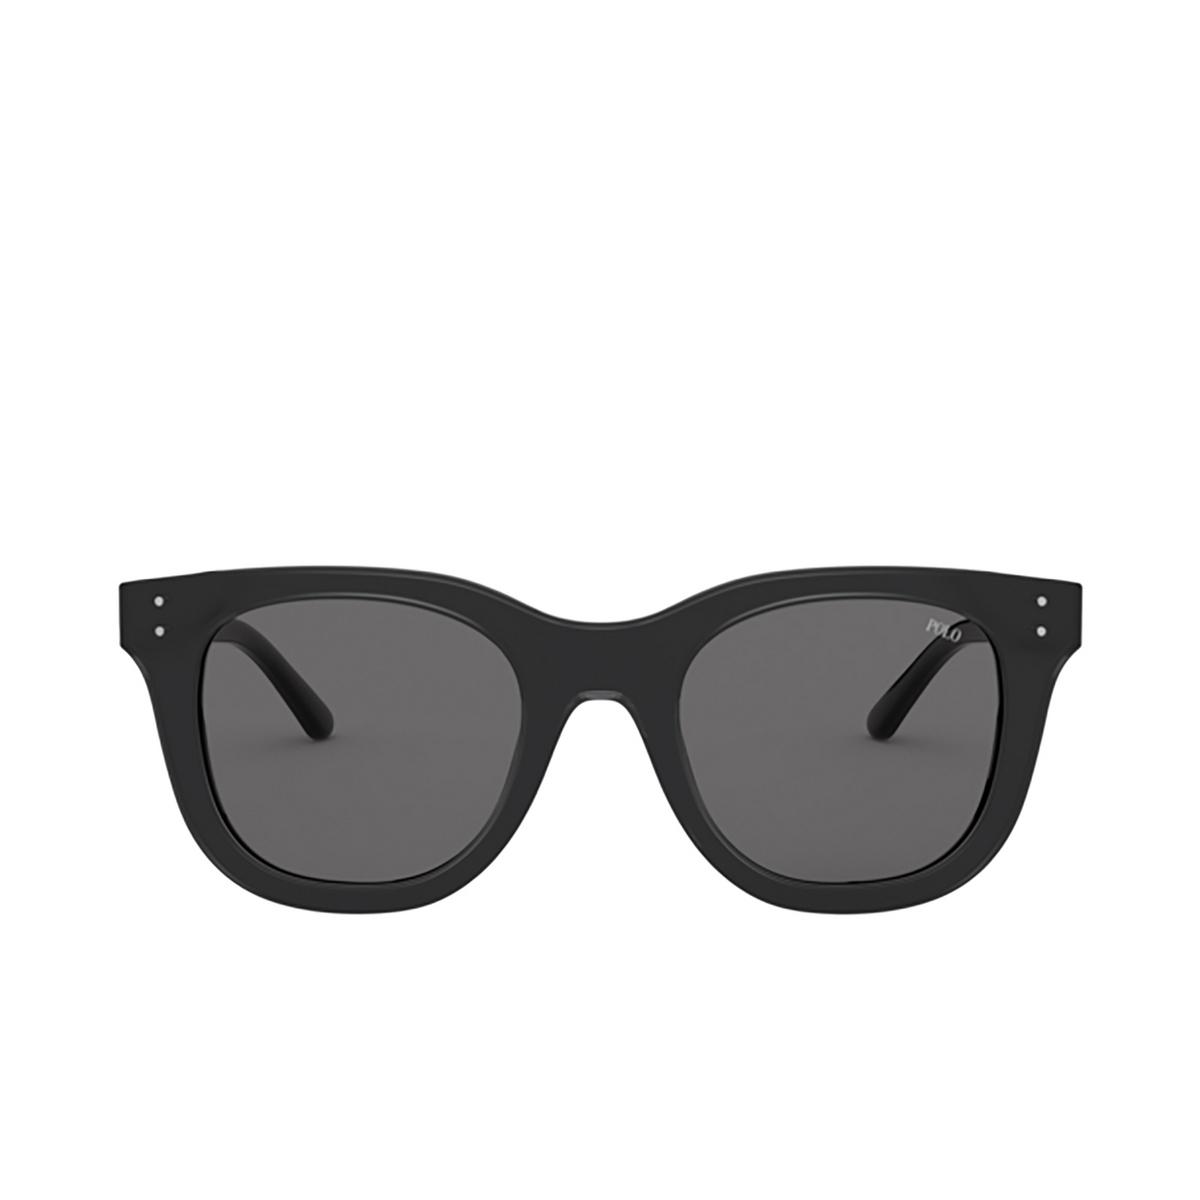 Polo Ralph Lauren® Square Sunglasses: PH4160 color Shiny Crystal On Black 581287.